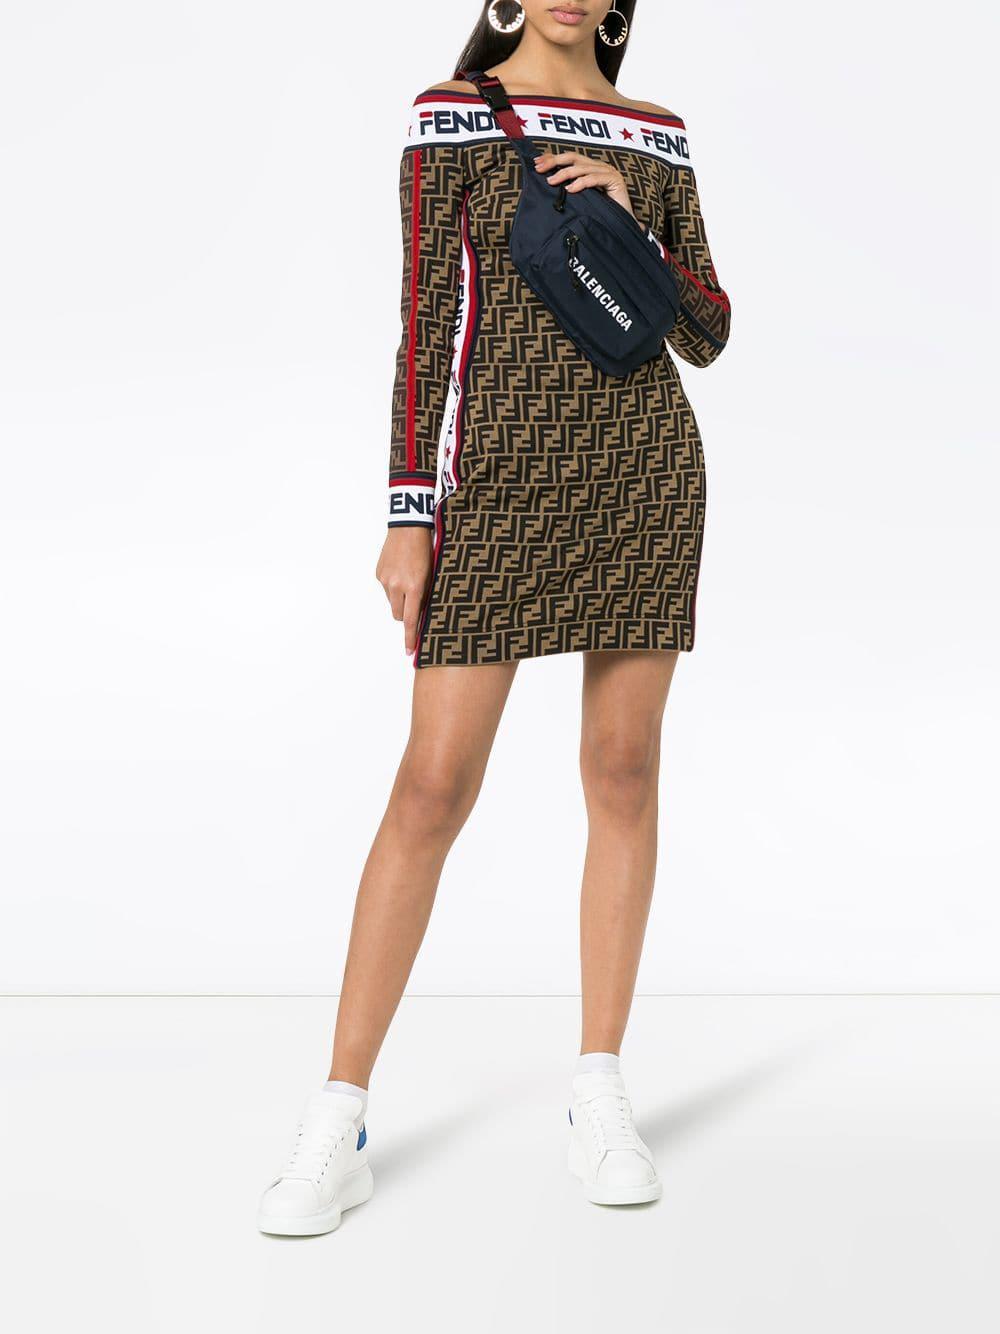 b7b7ff4ae464 Lyst - Fendi Mania Logo Cotton Jersey Dress in Brown - Save 33%